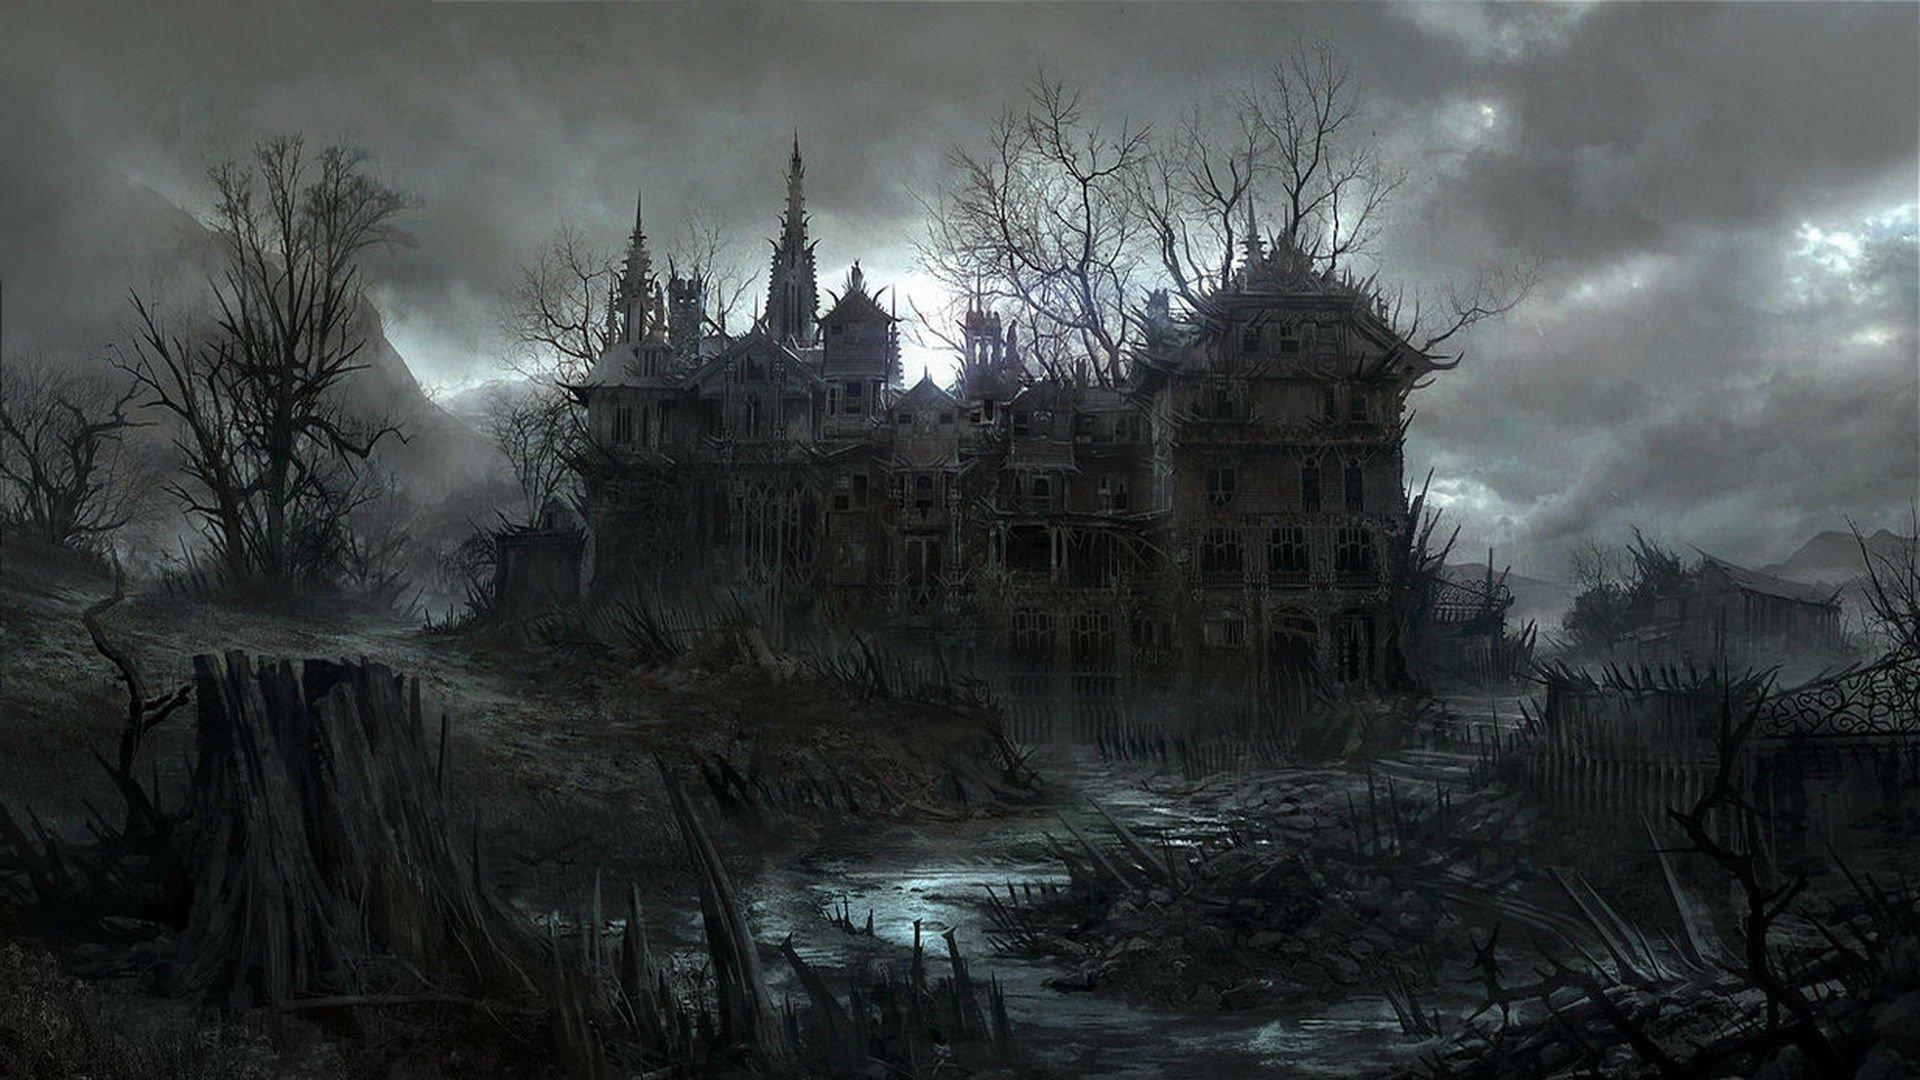 HALLOWEEN dark haunted house spooky wallpaper 1920x1080 497956 1920x1080